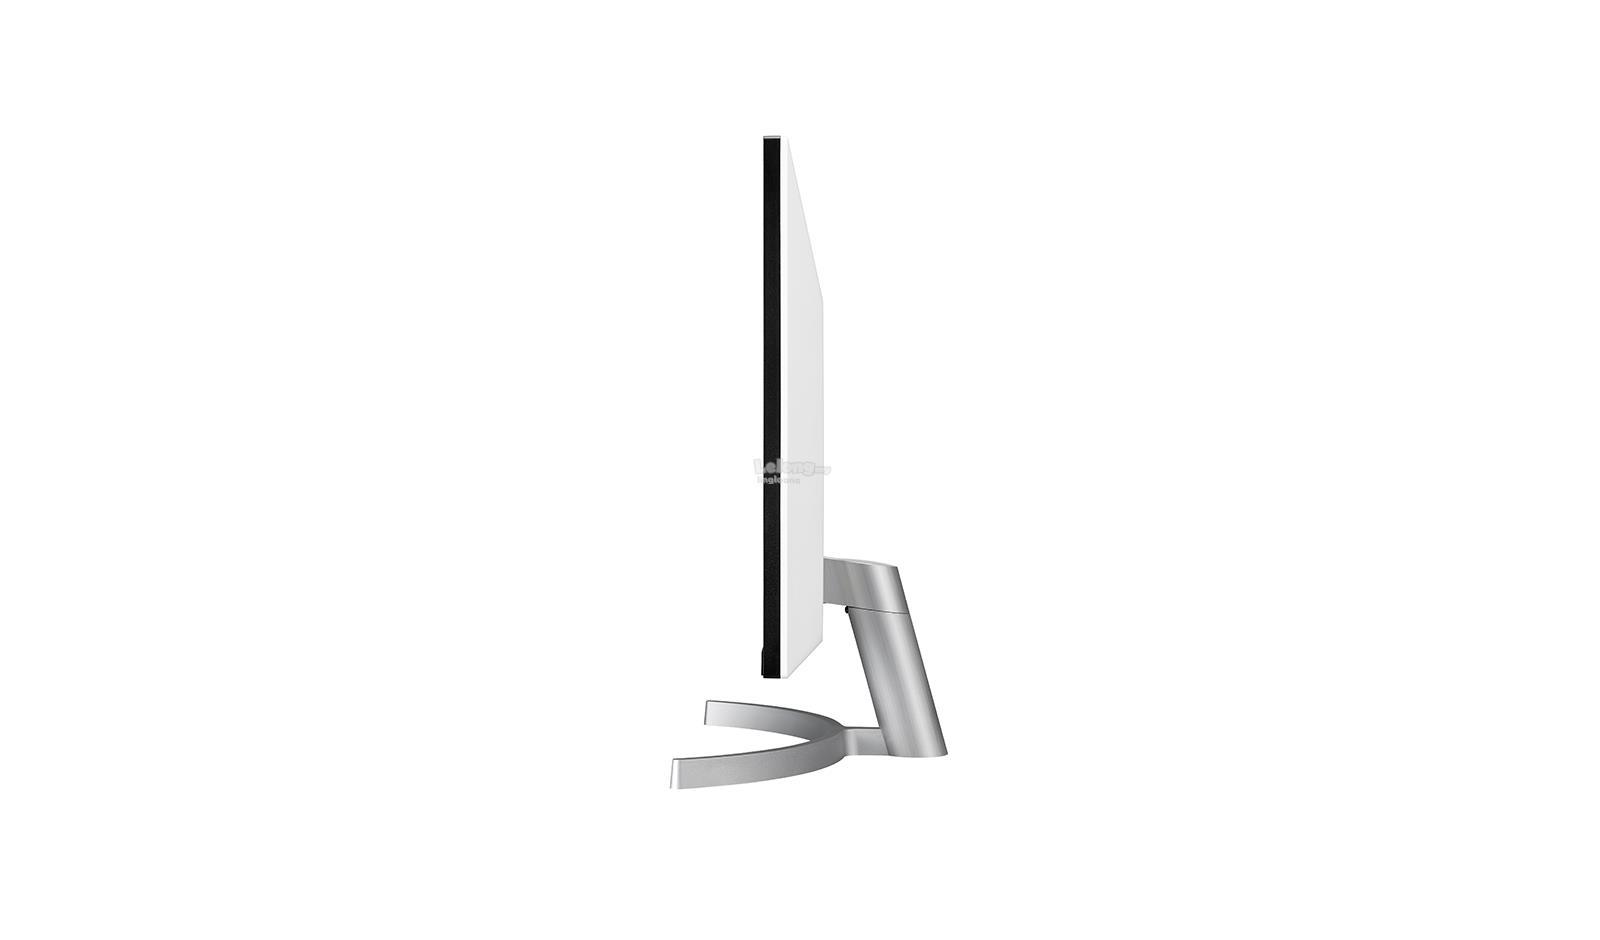 # LG 27UK600-W 27' IPS 4K UHD Gaming Monitor # AMD FreeSync